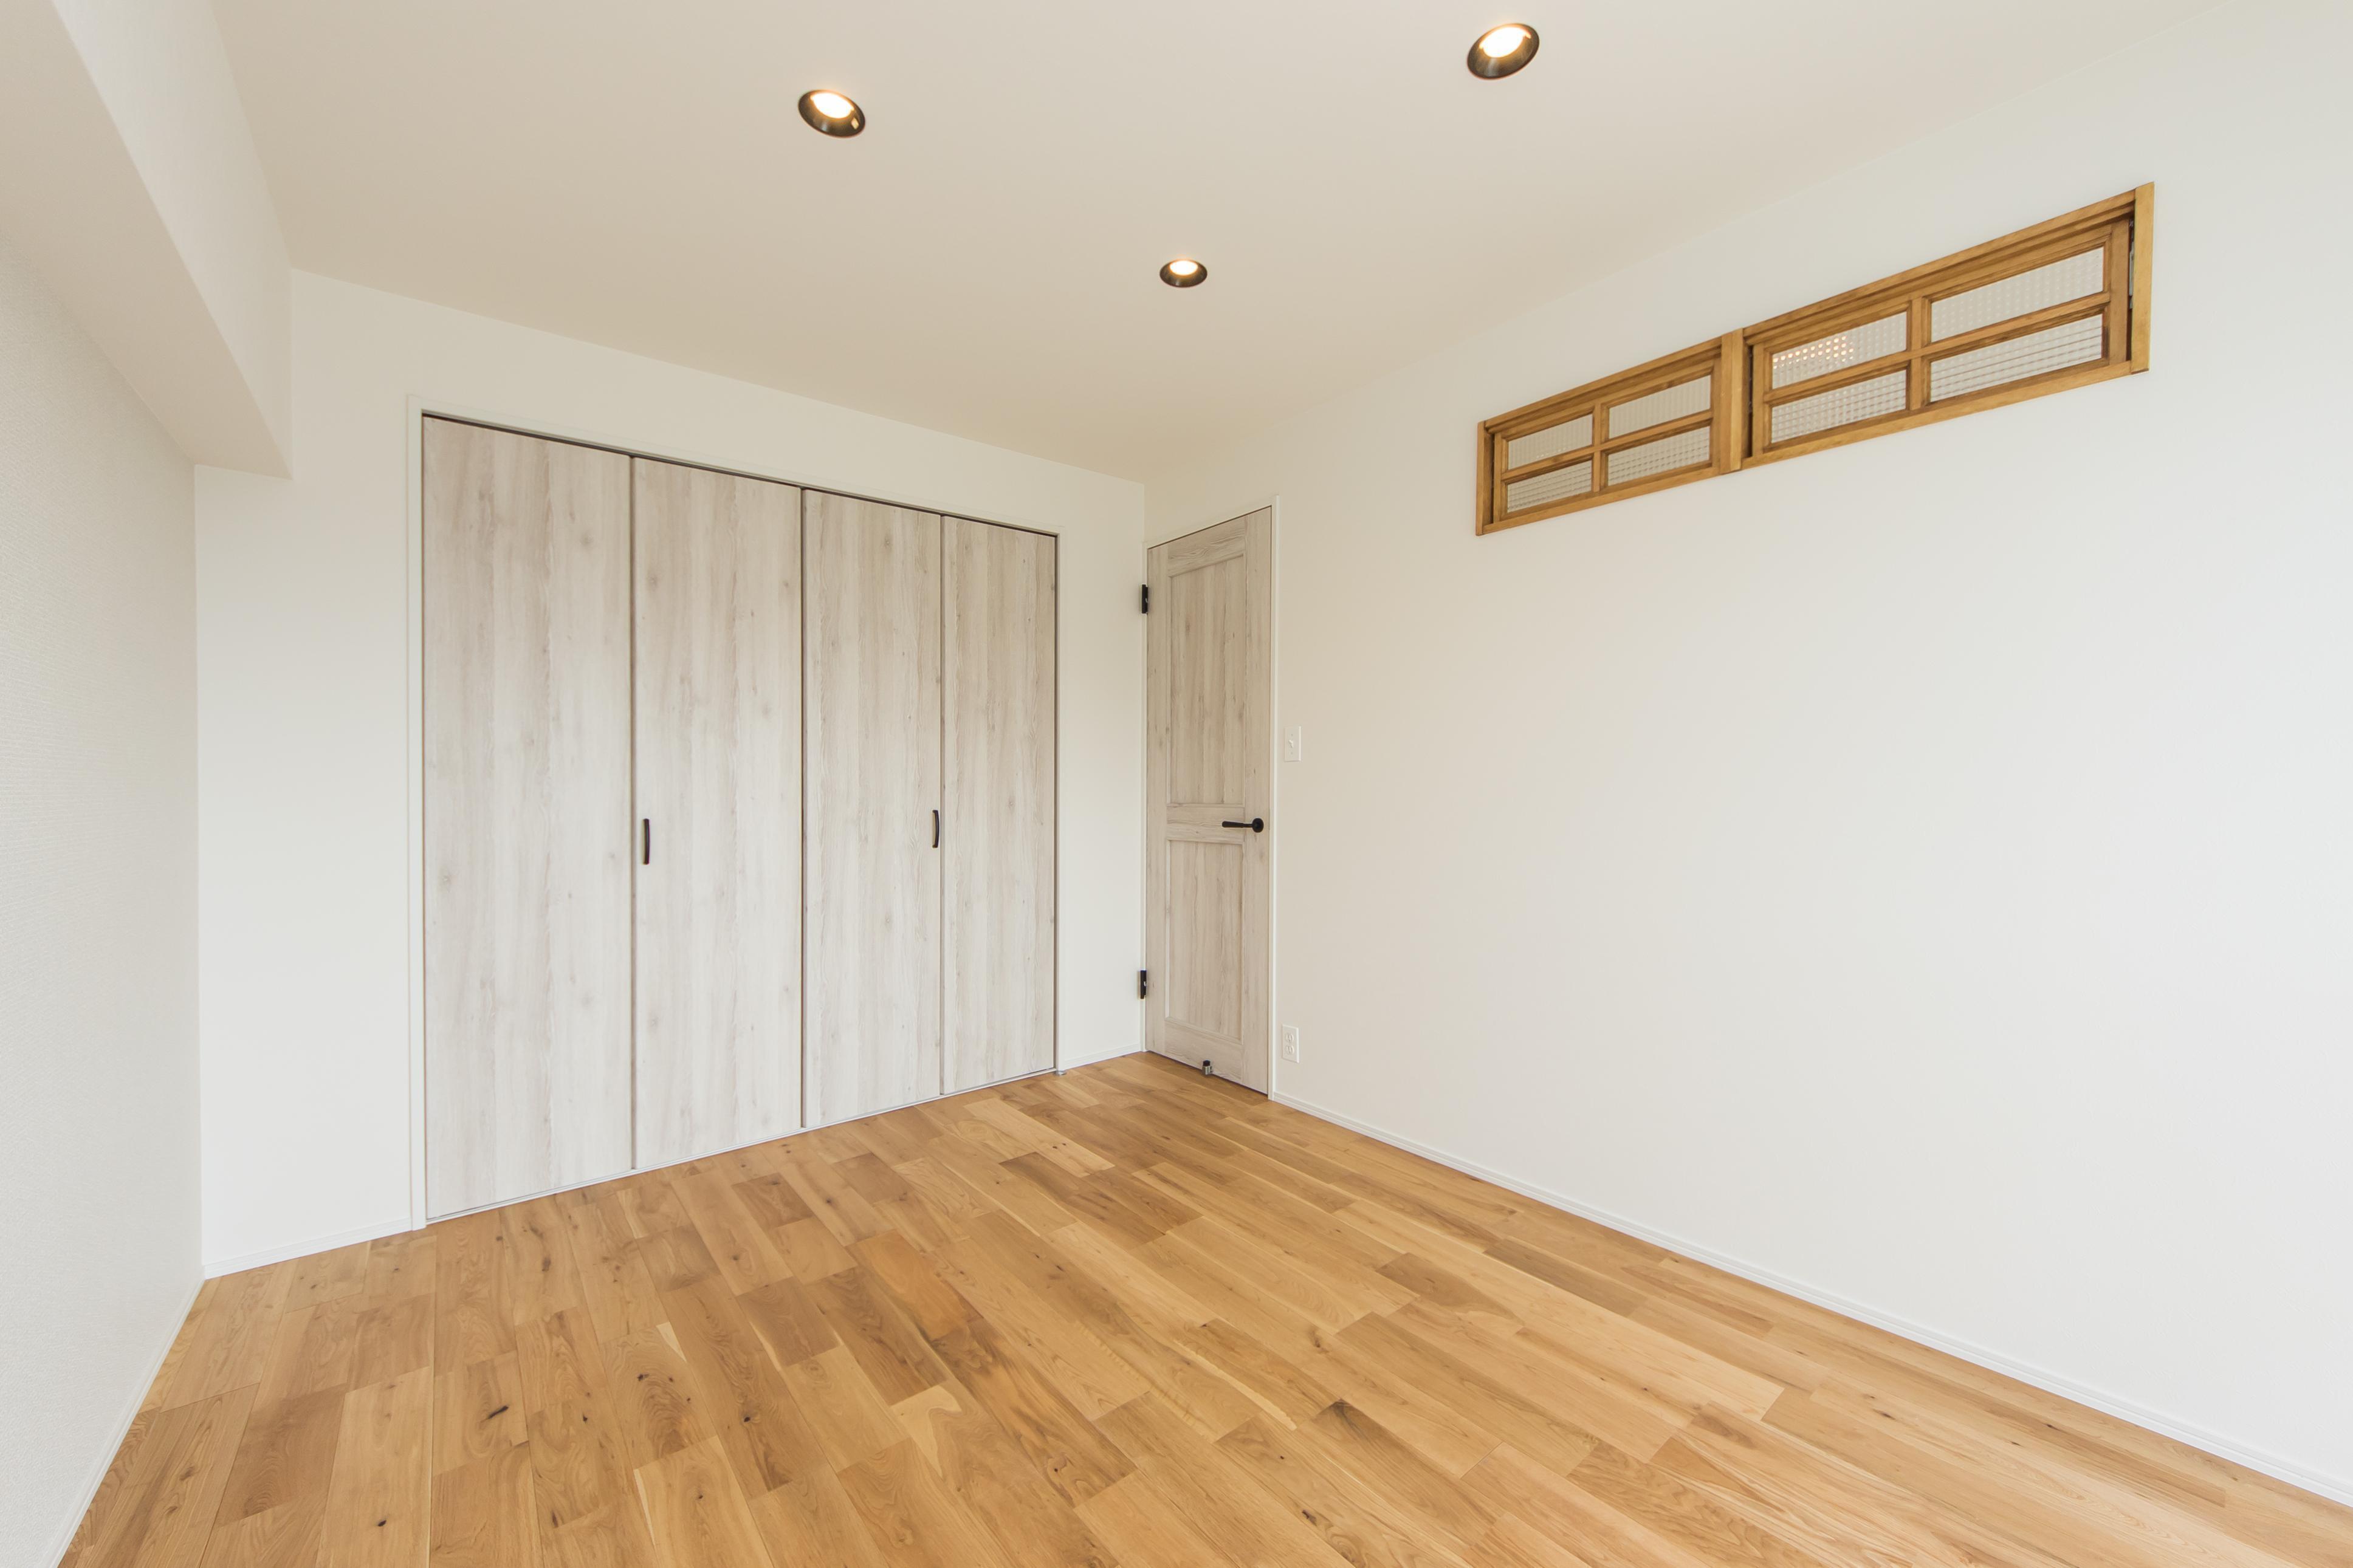 寝室、室内窓、天然素材、無垢フローリング、一歩